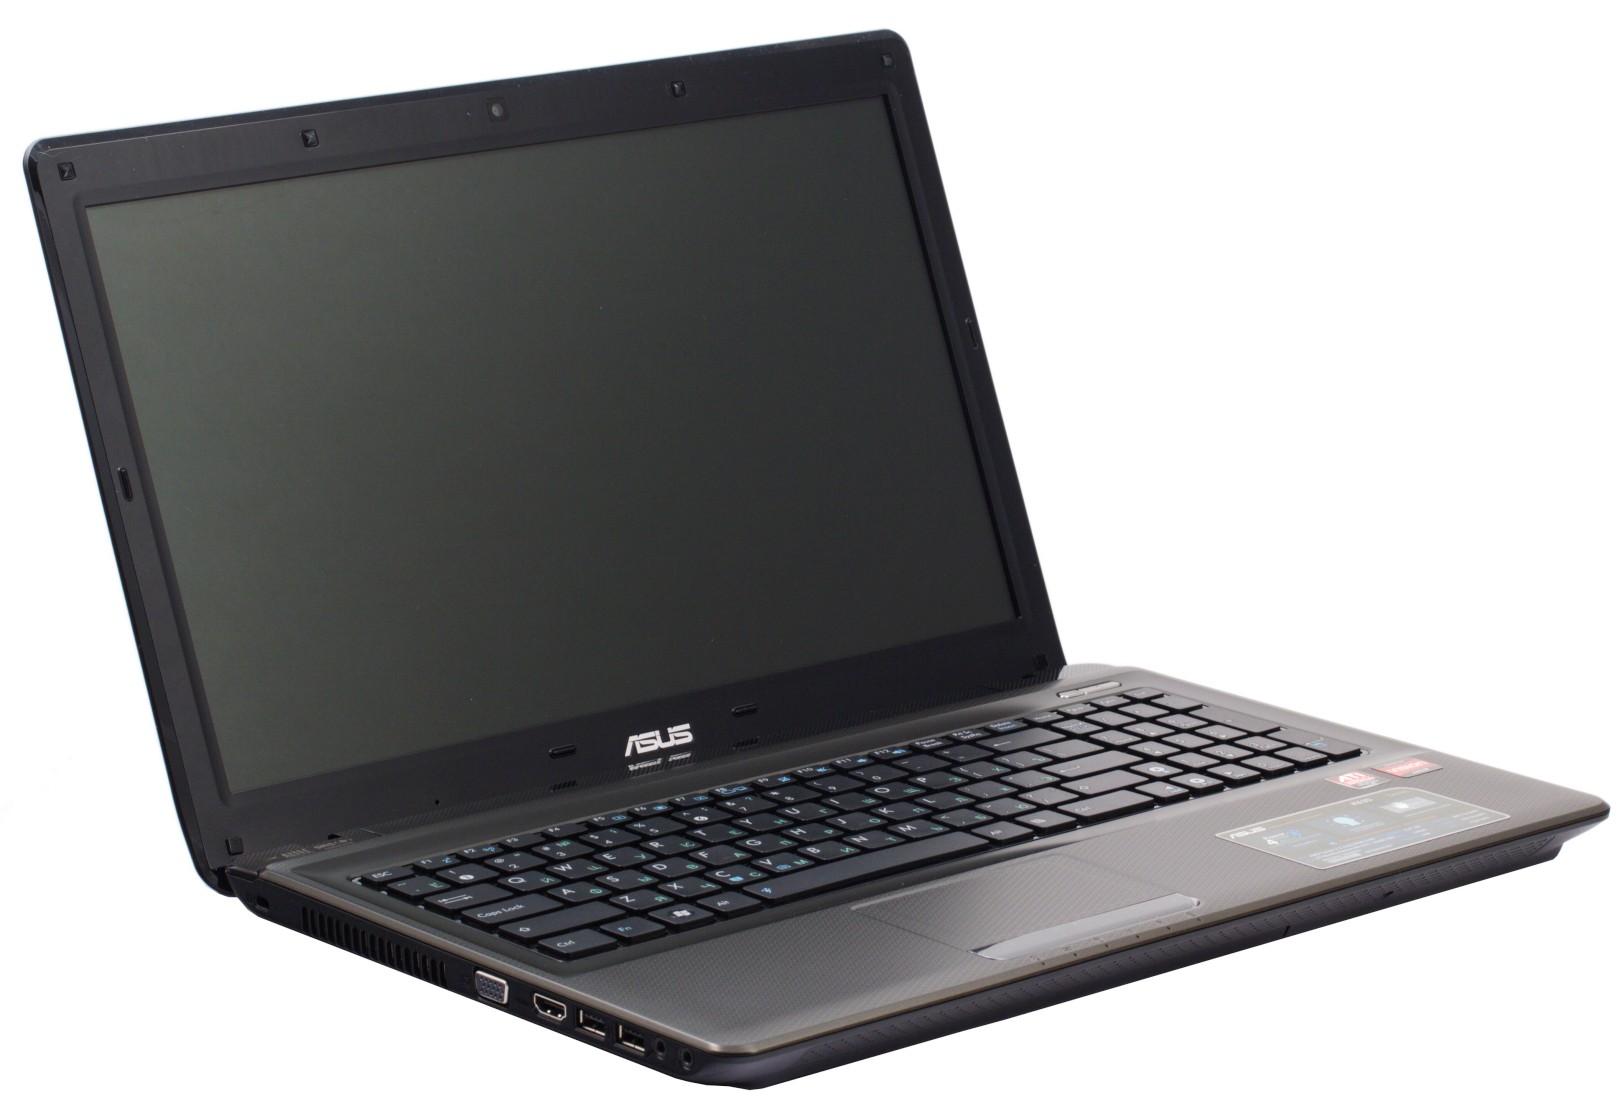 ноутбук asus k52d цена